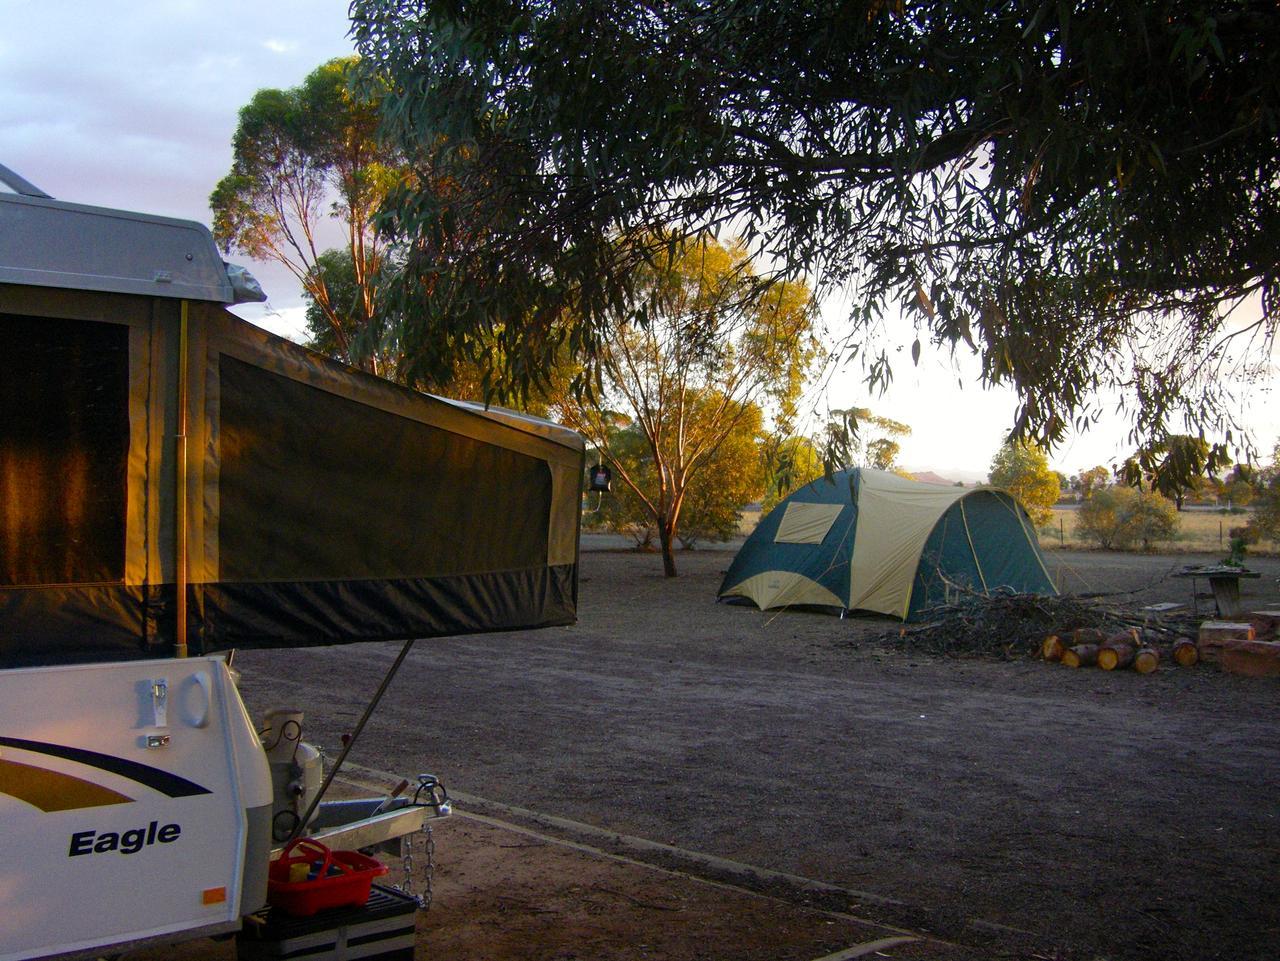 Sunrise over our campsite.